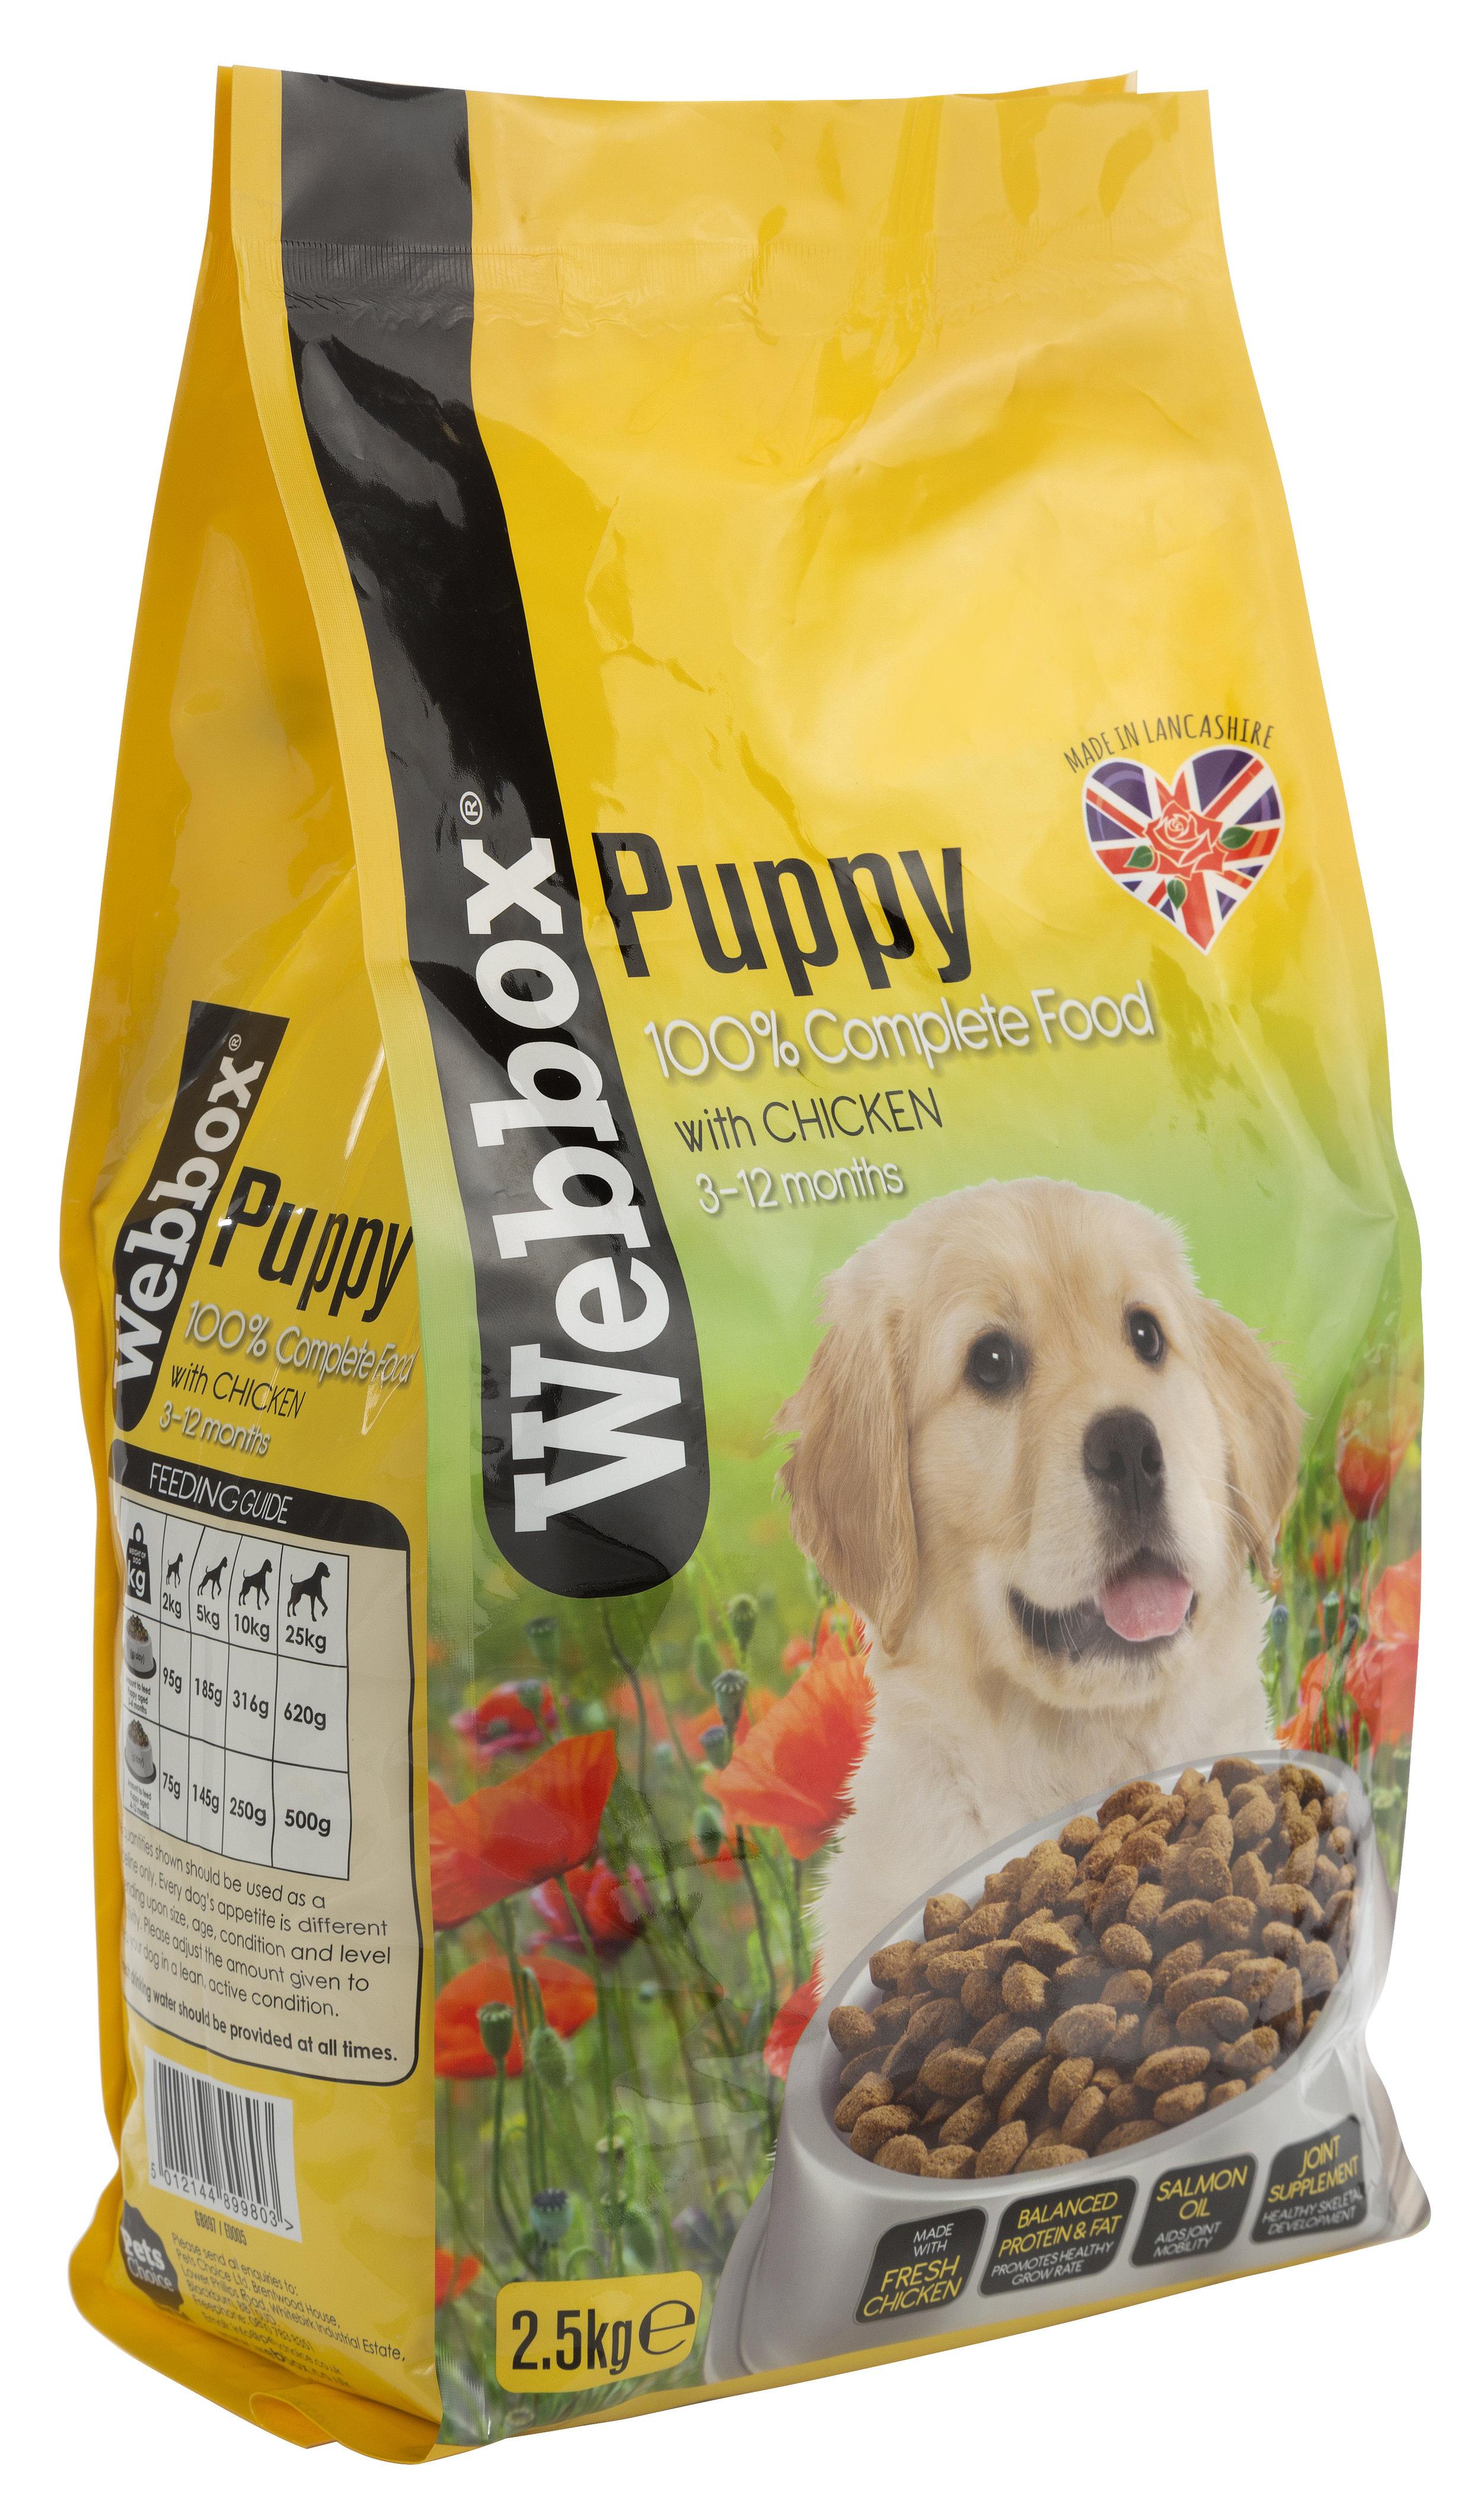 Webbox Puppy  100% Complete